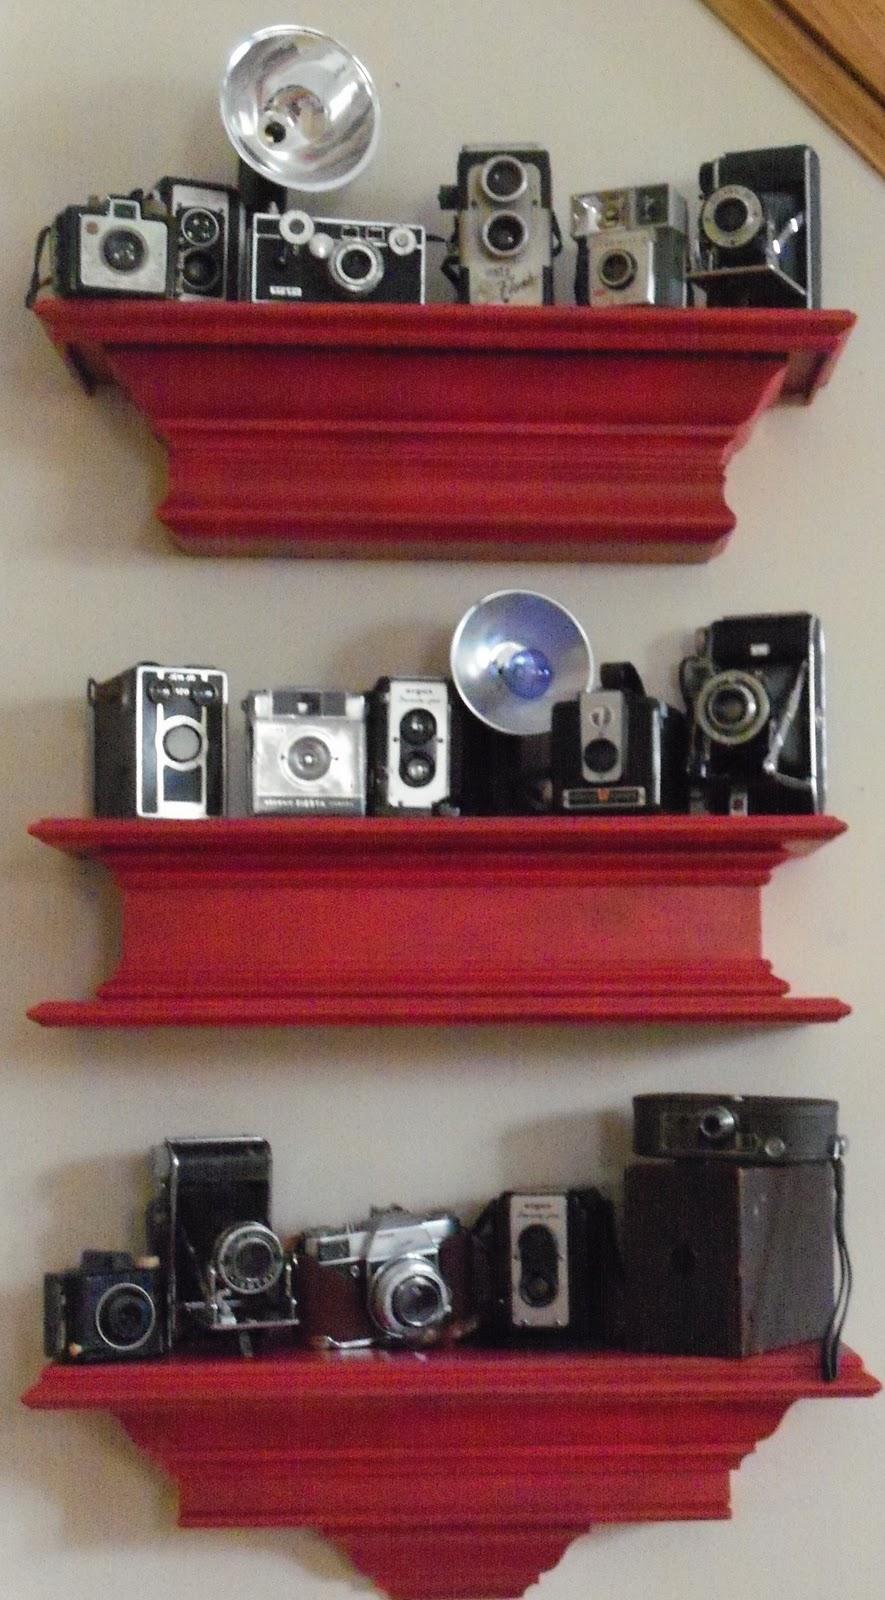 Camera+shelf+2+002